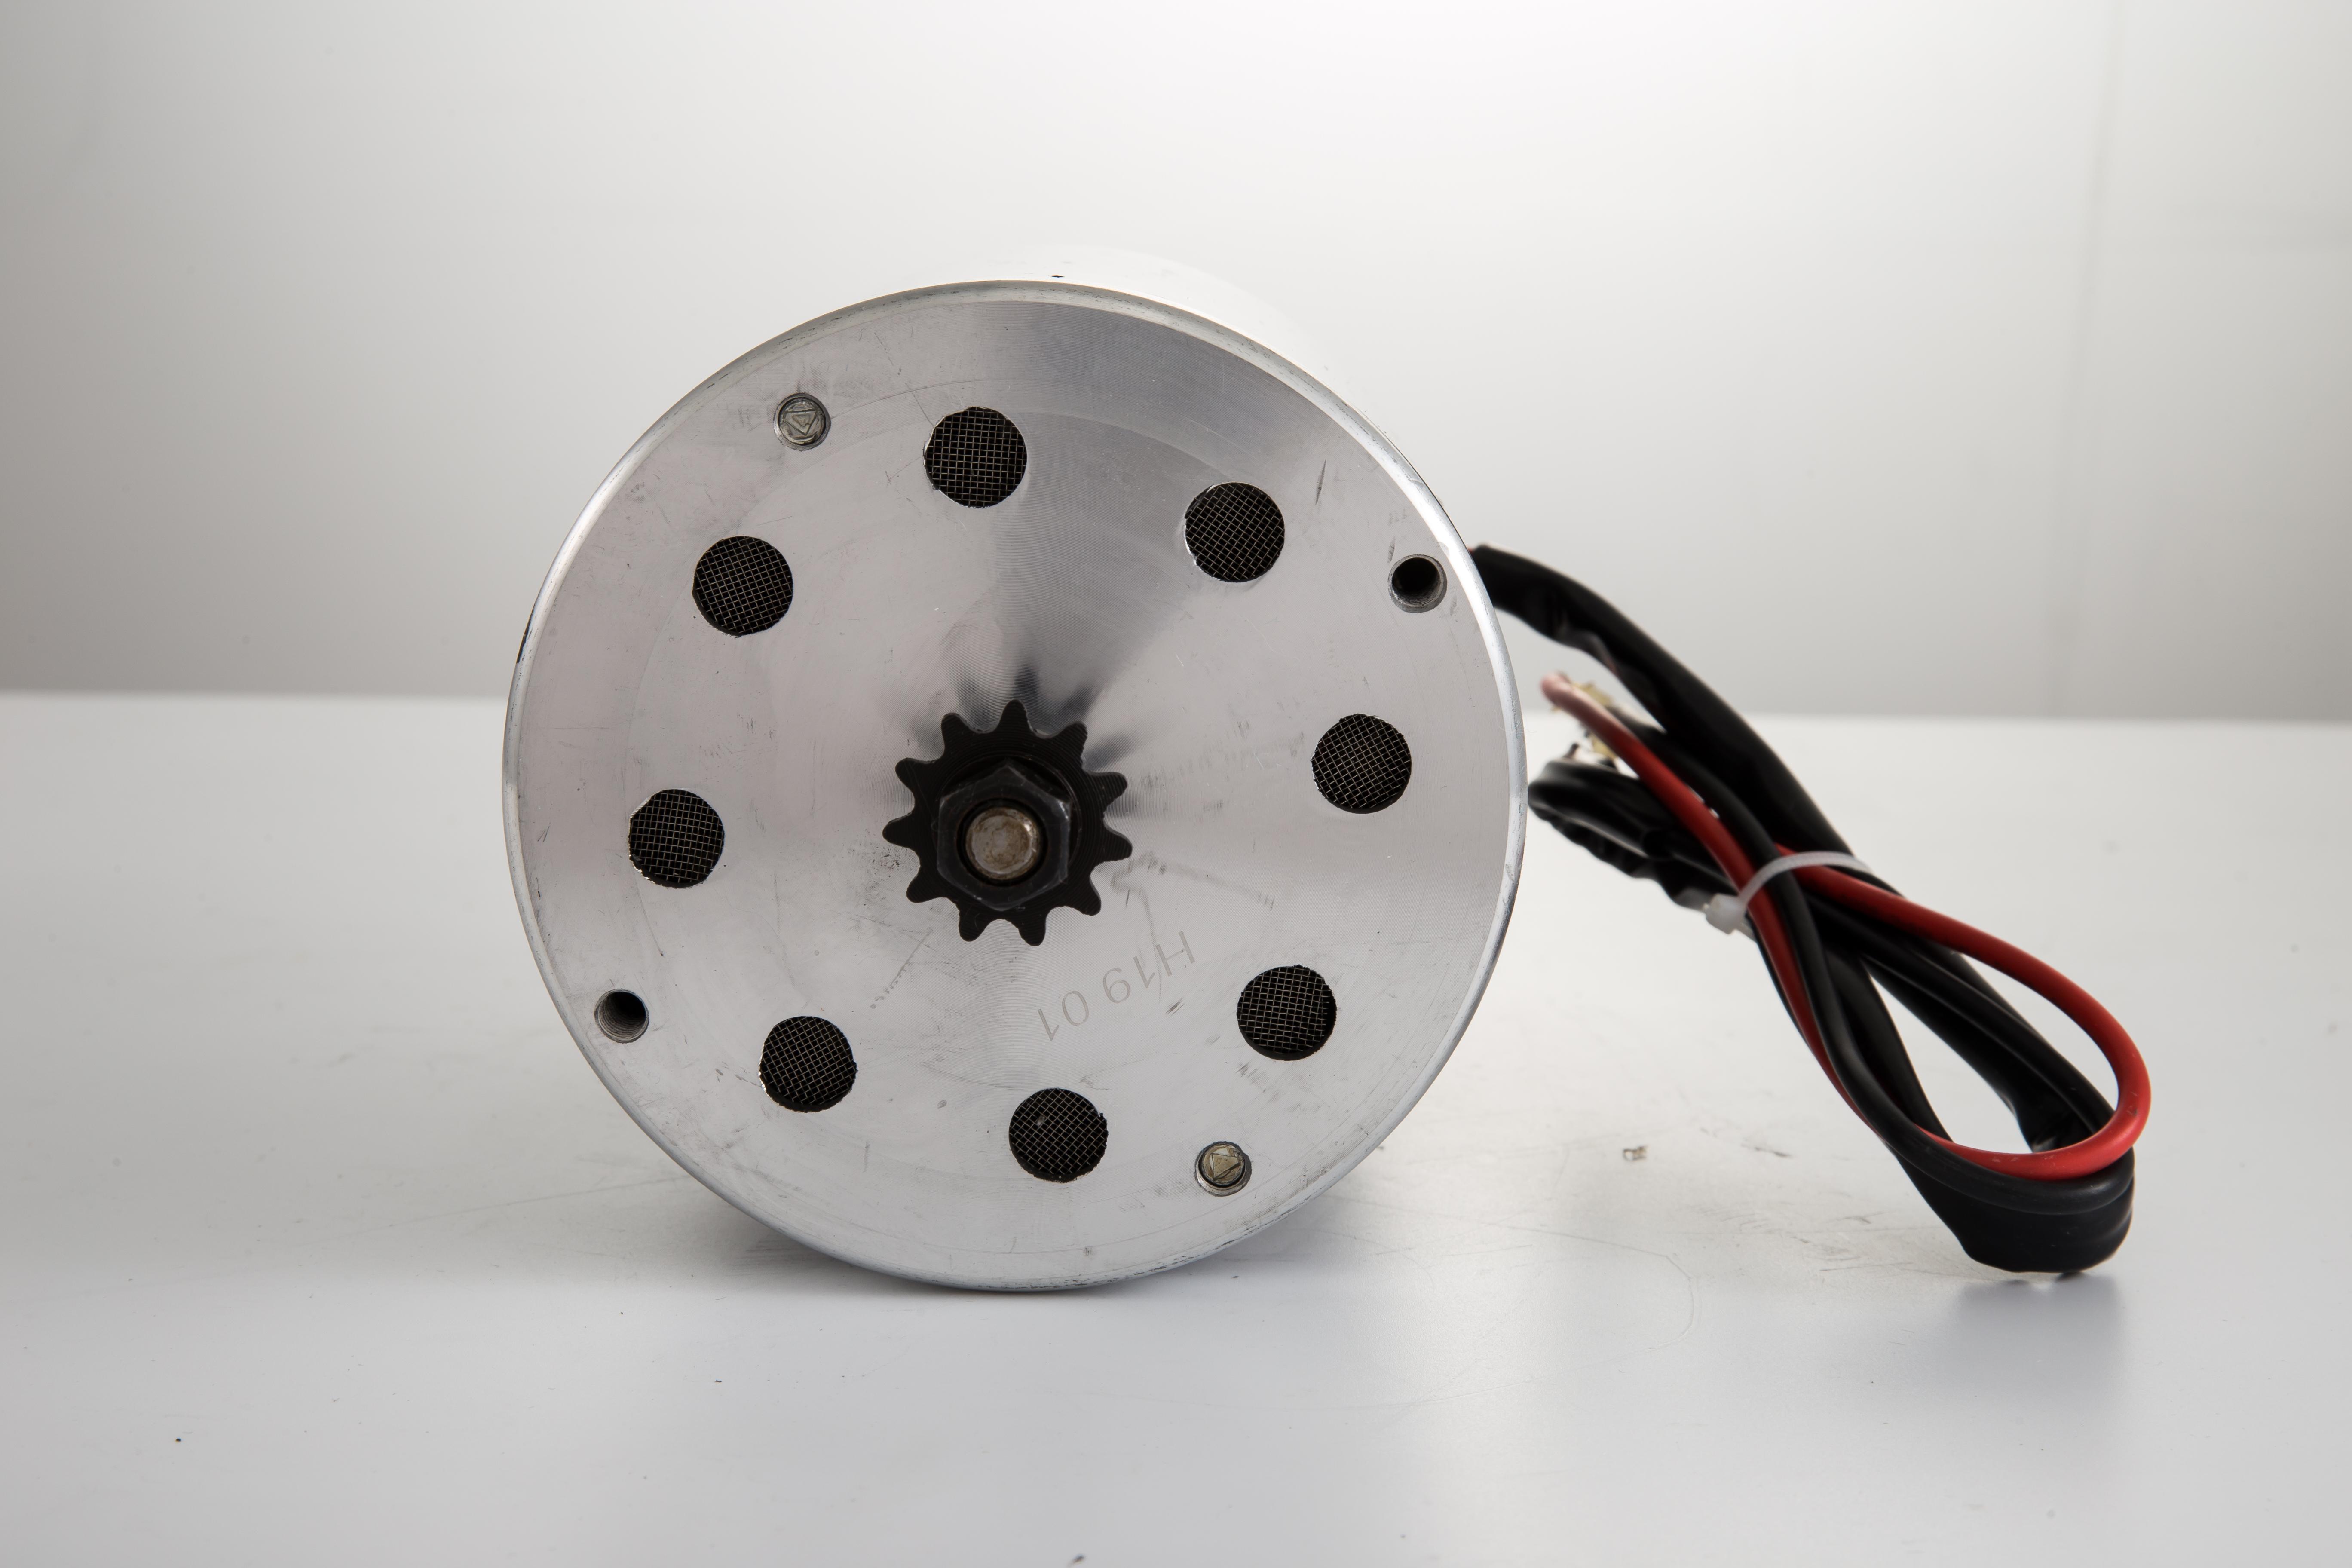 36v-Electric-Motor-controller-throttle-kit-f-Scooter-E-Scooter-ATV-Permanent thumbnail 137